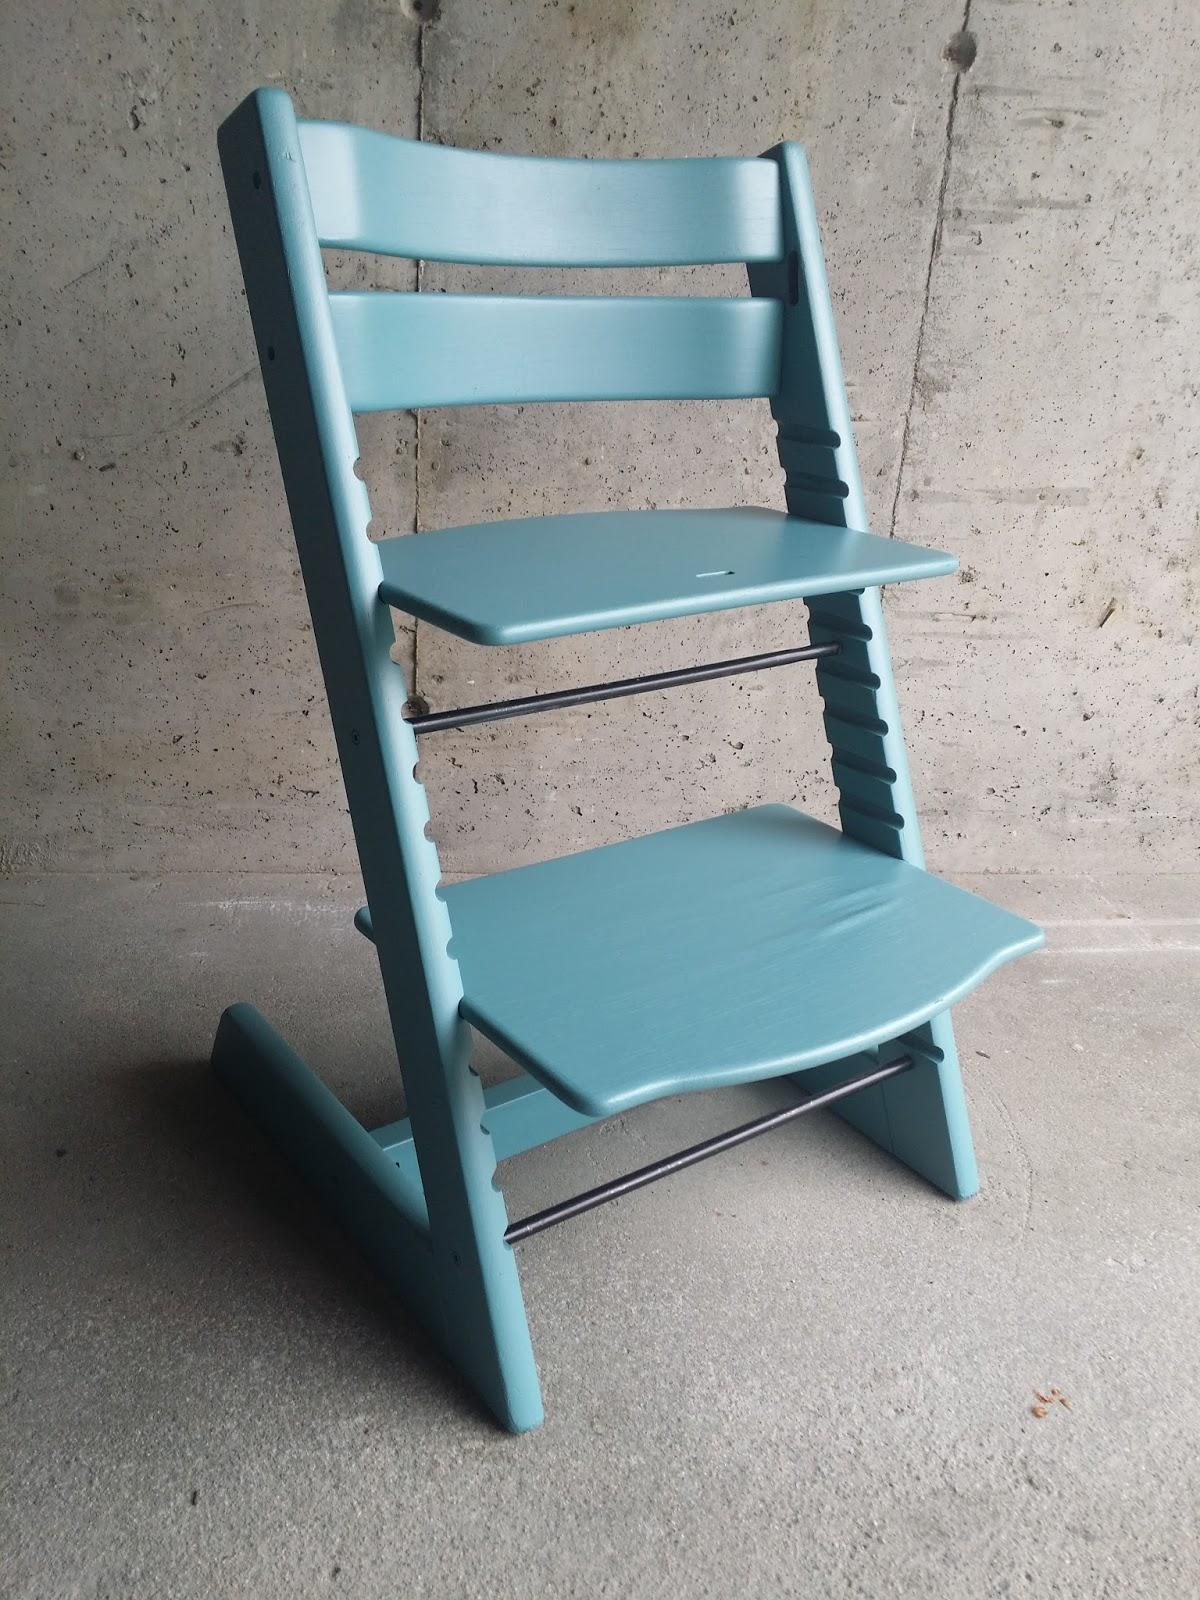 Tripp trapp stol farger